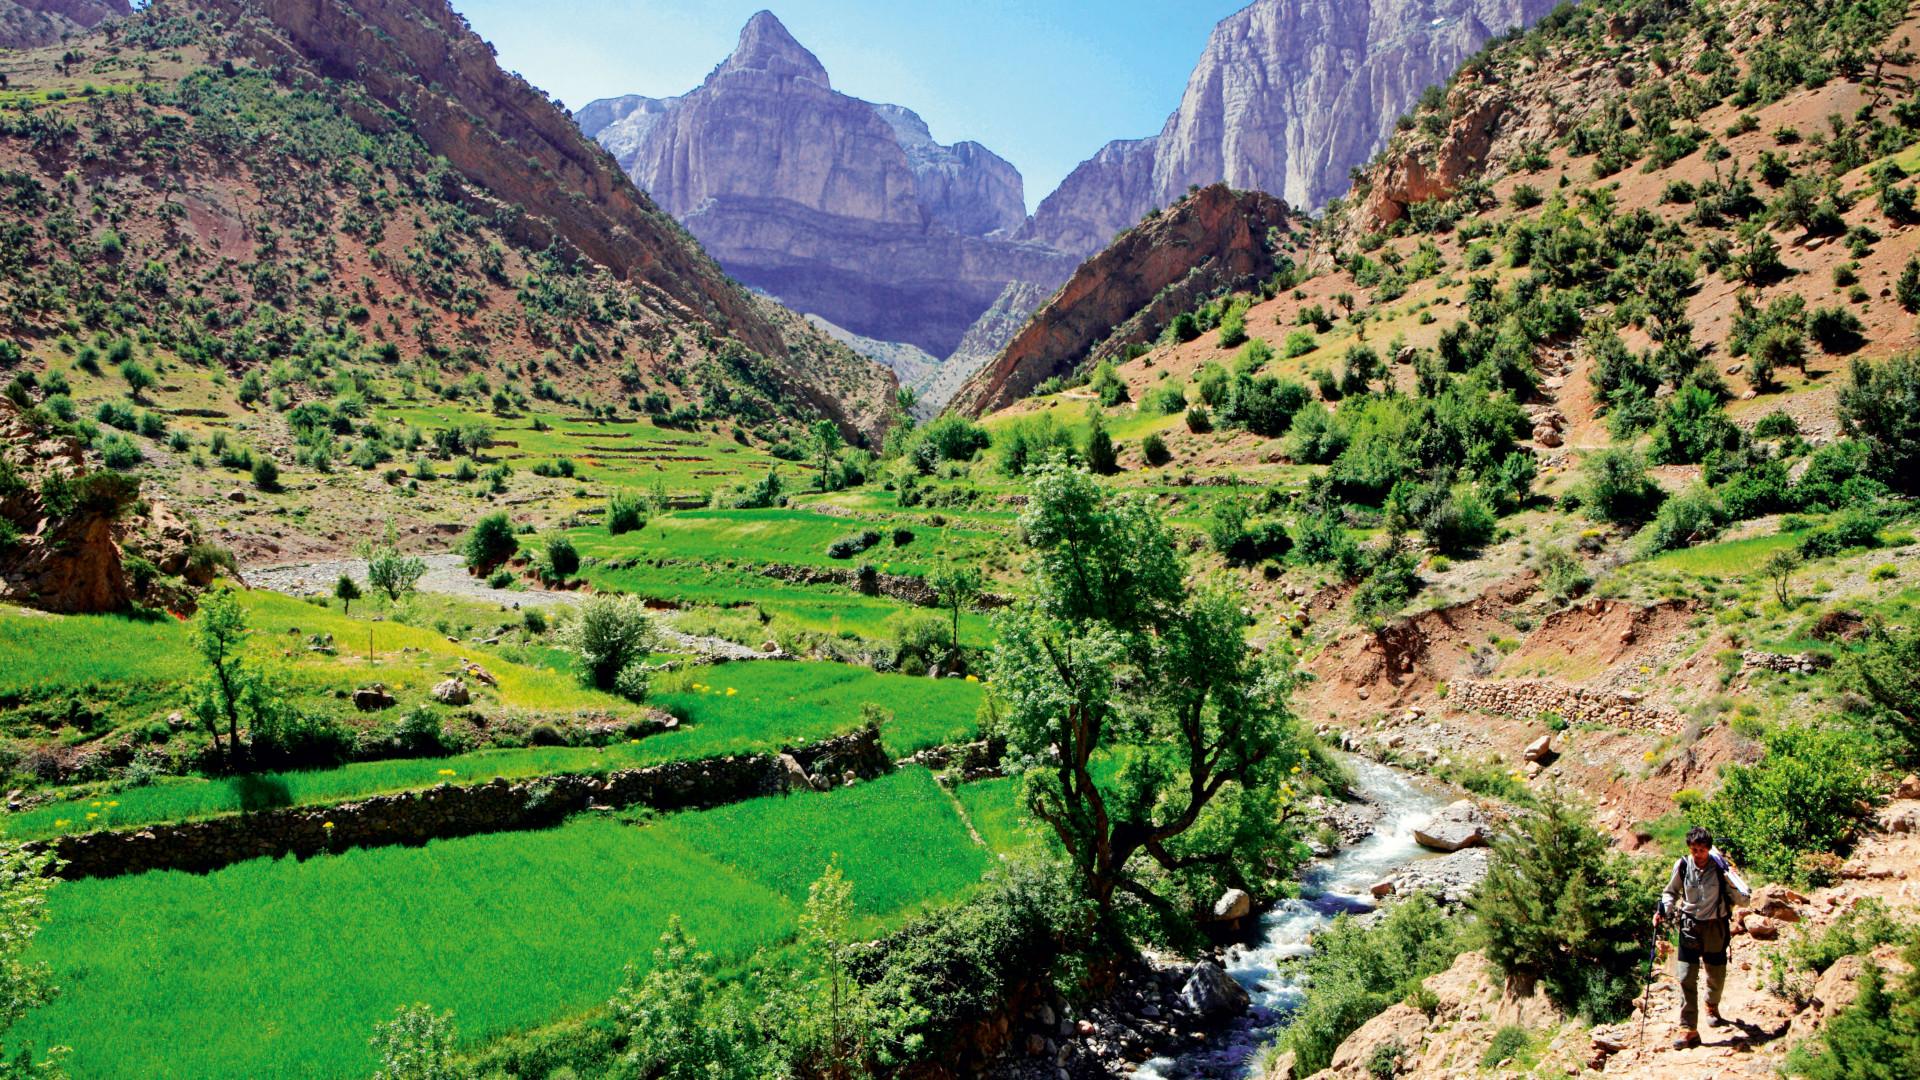 Exceptional views across the Atlas mountains, Morocco